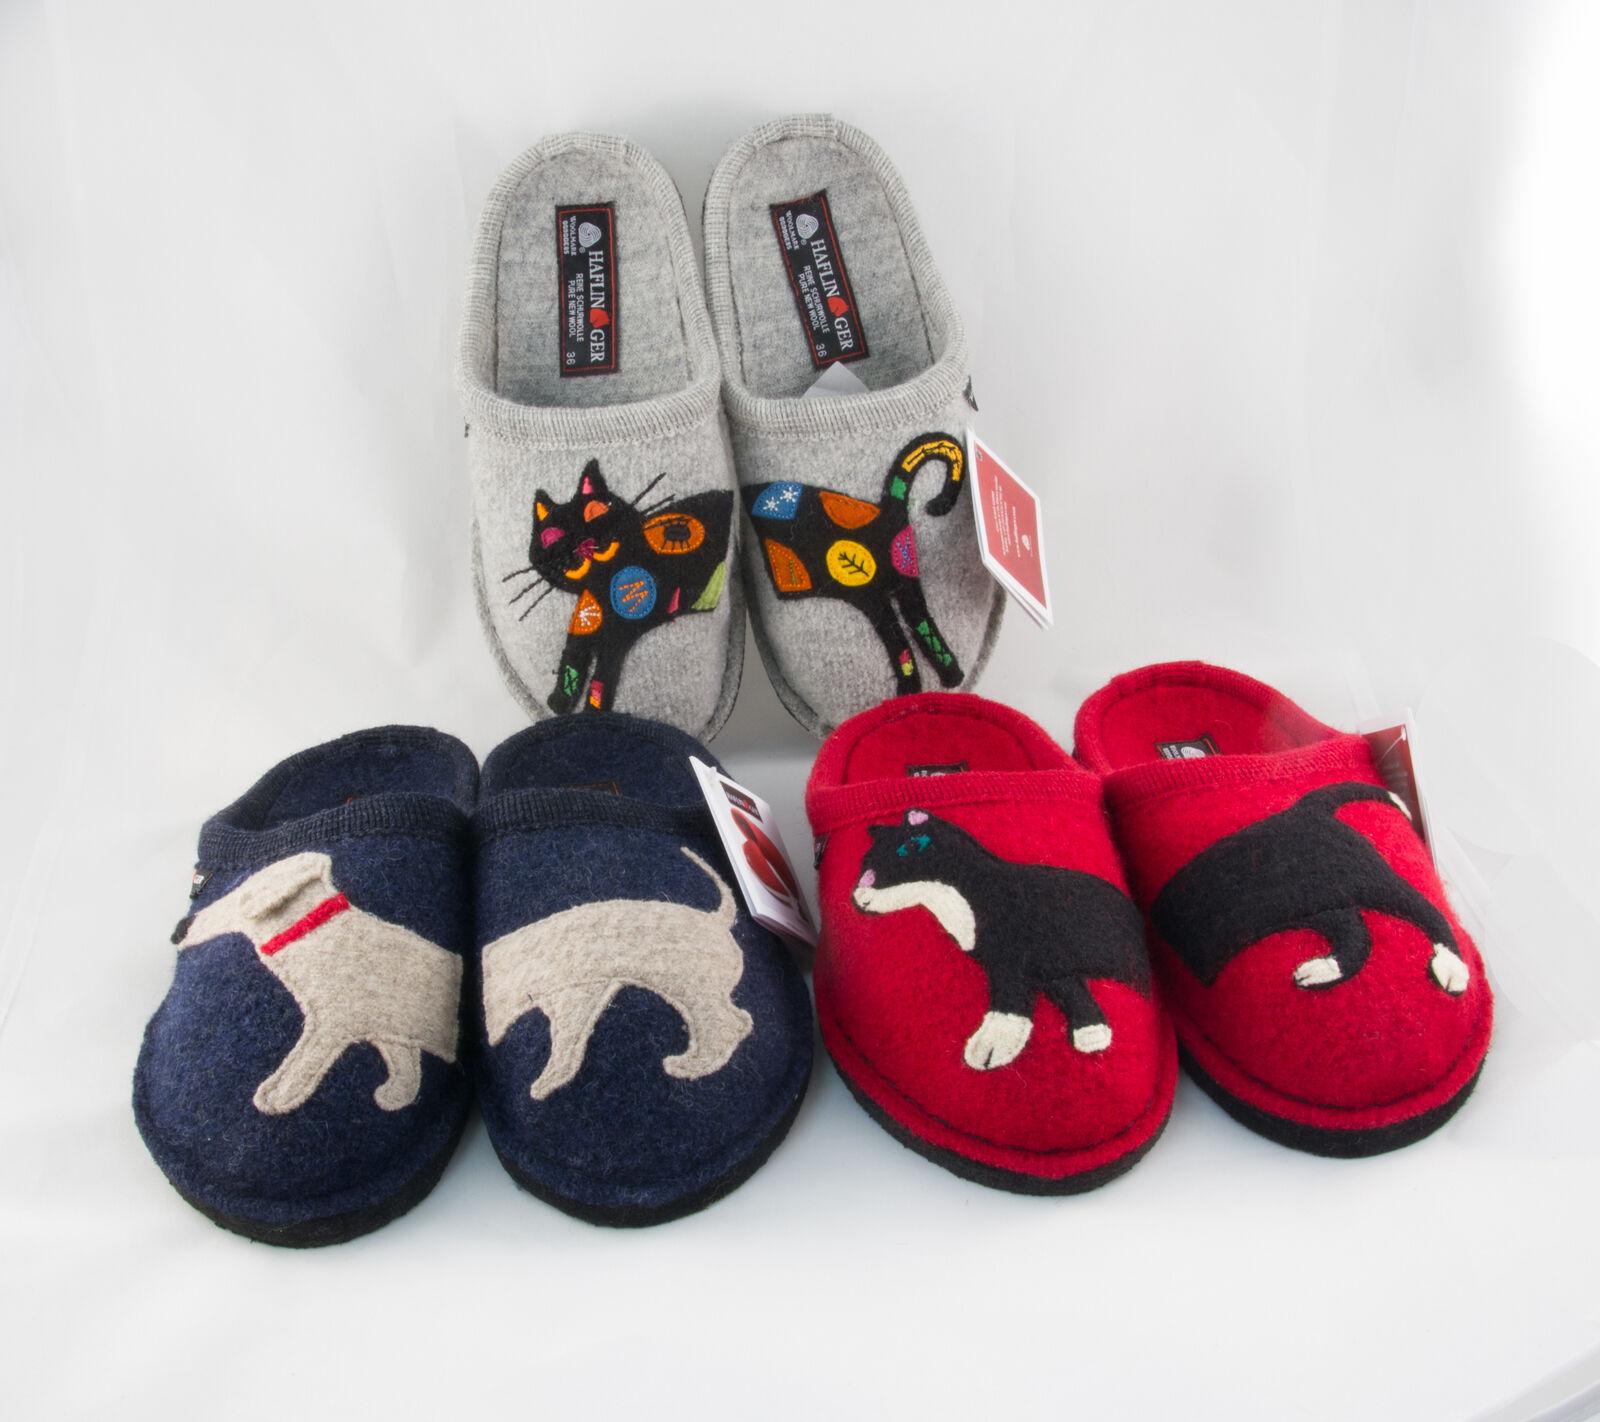 Haflinger Flair ciabatte sabot lana calde pantofole babbuccie